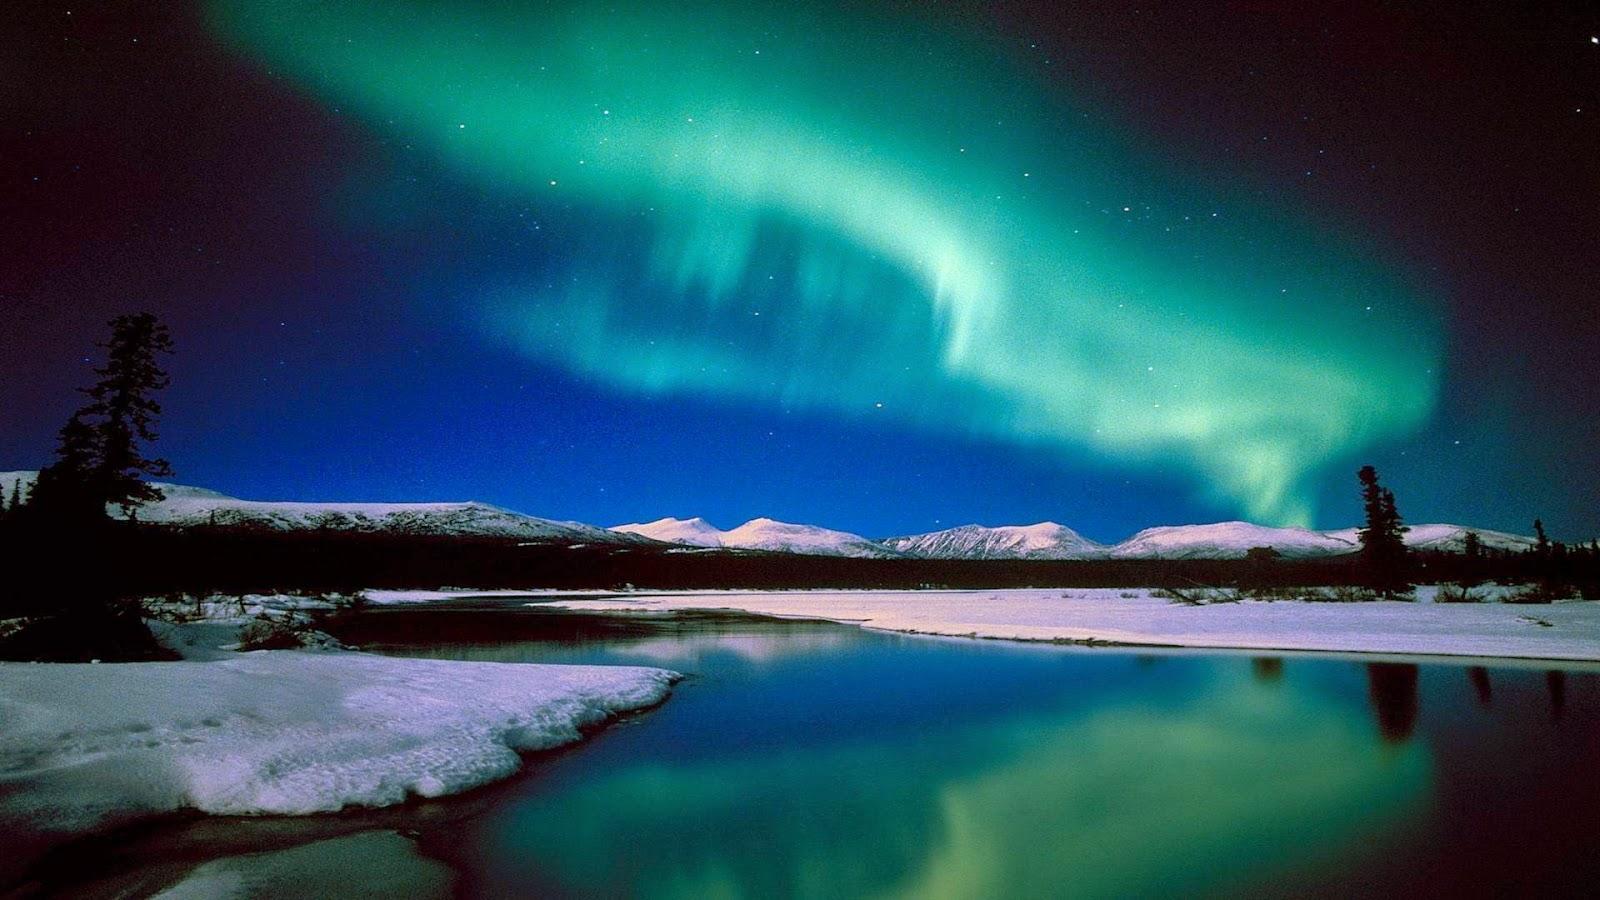 20 Amazing Colorful Aurora Borealis Wallpapers HD -o- | 1 Wallpaper Picture Photo